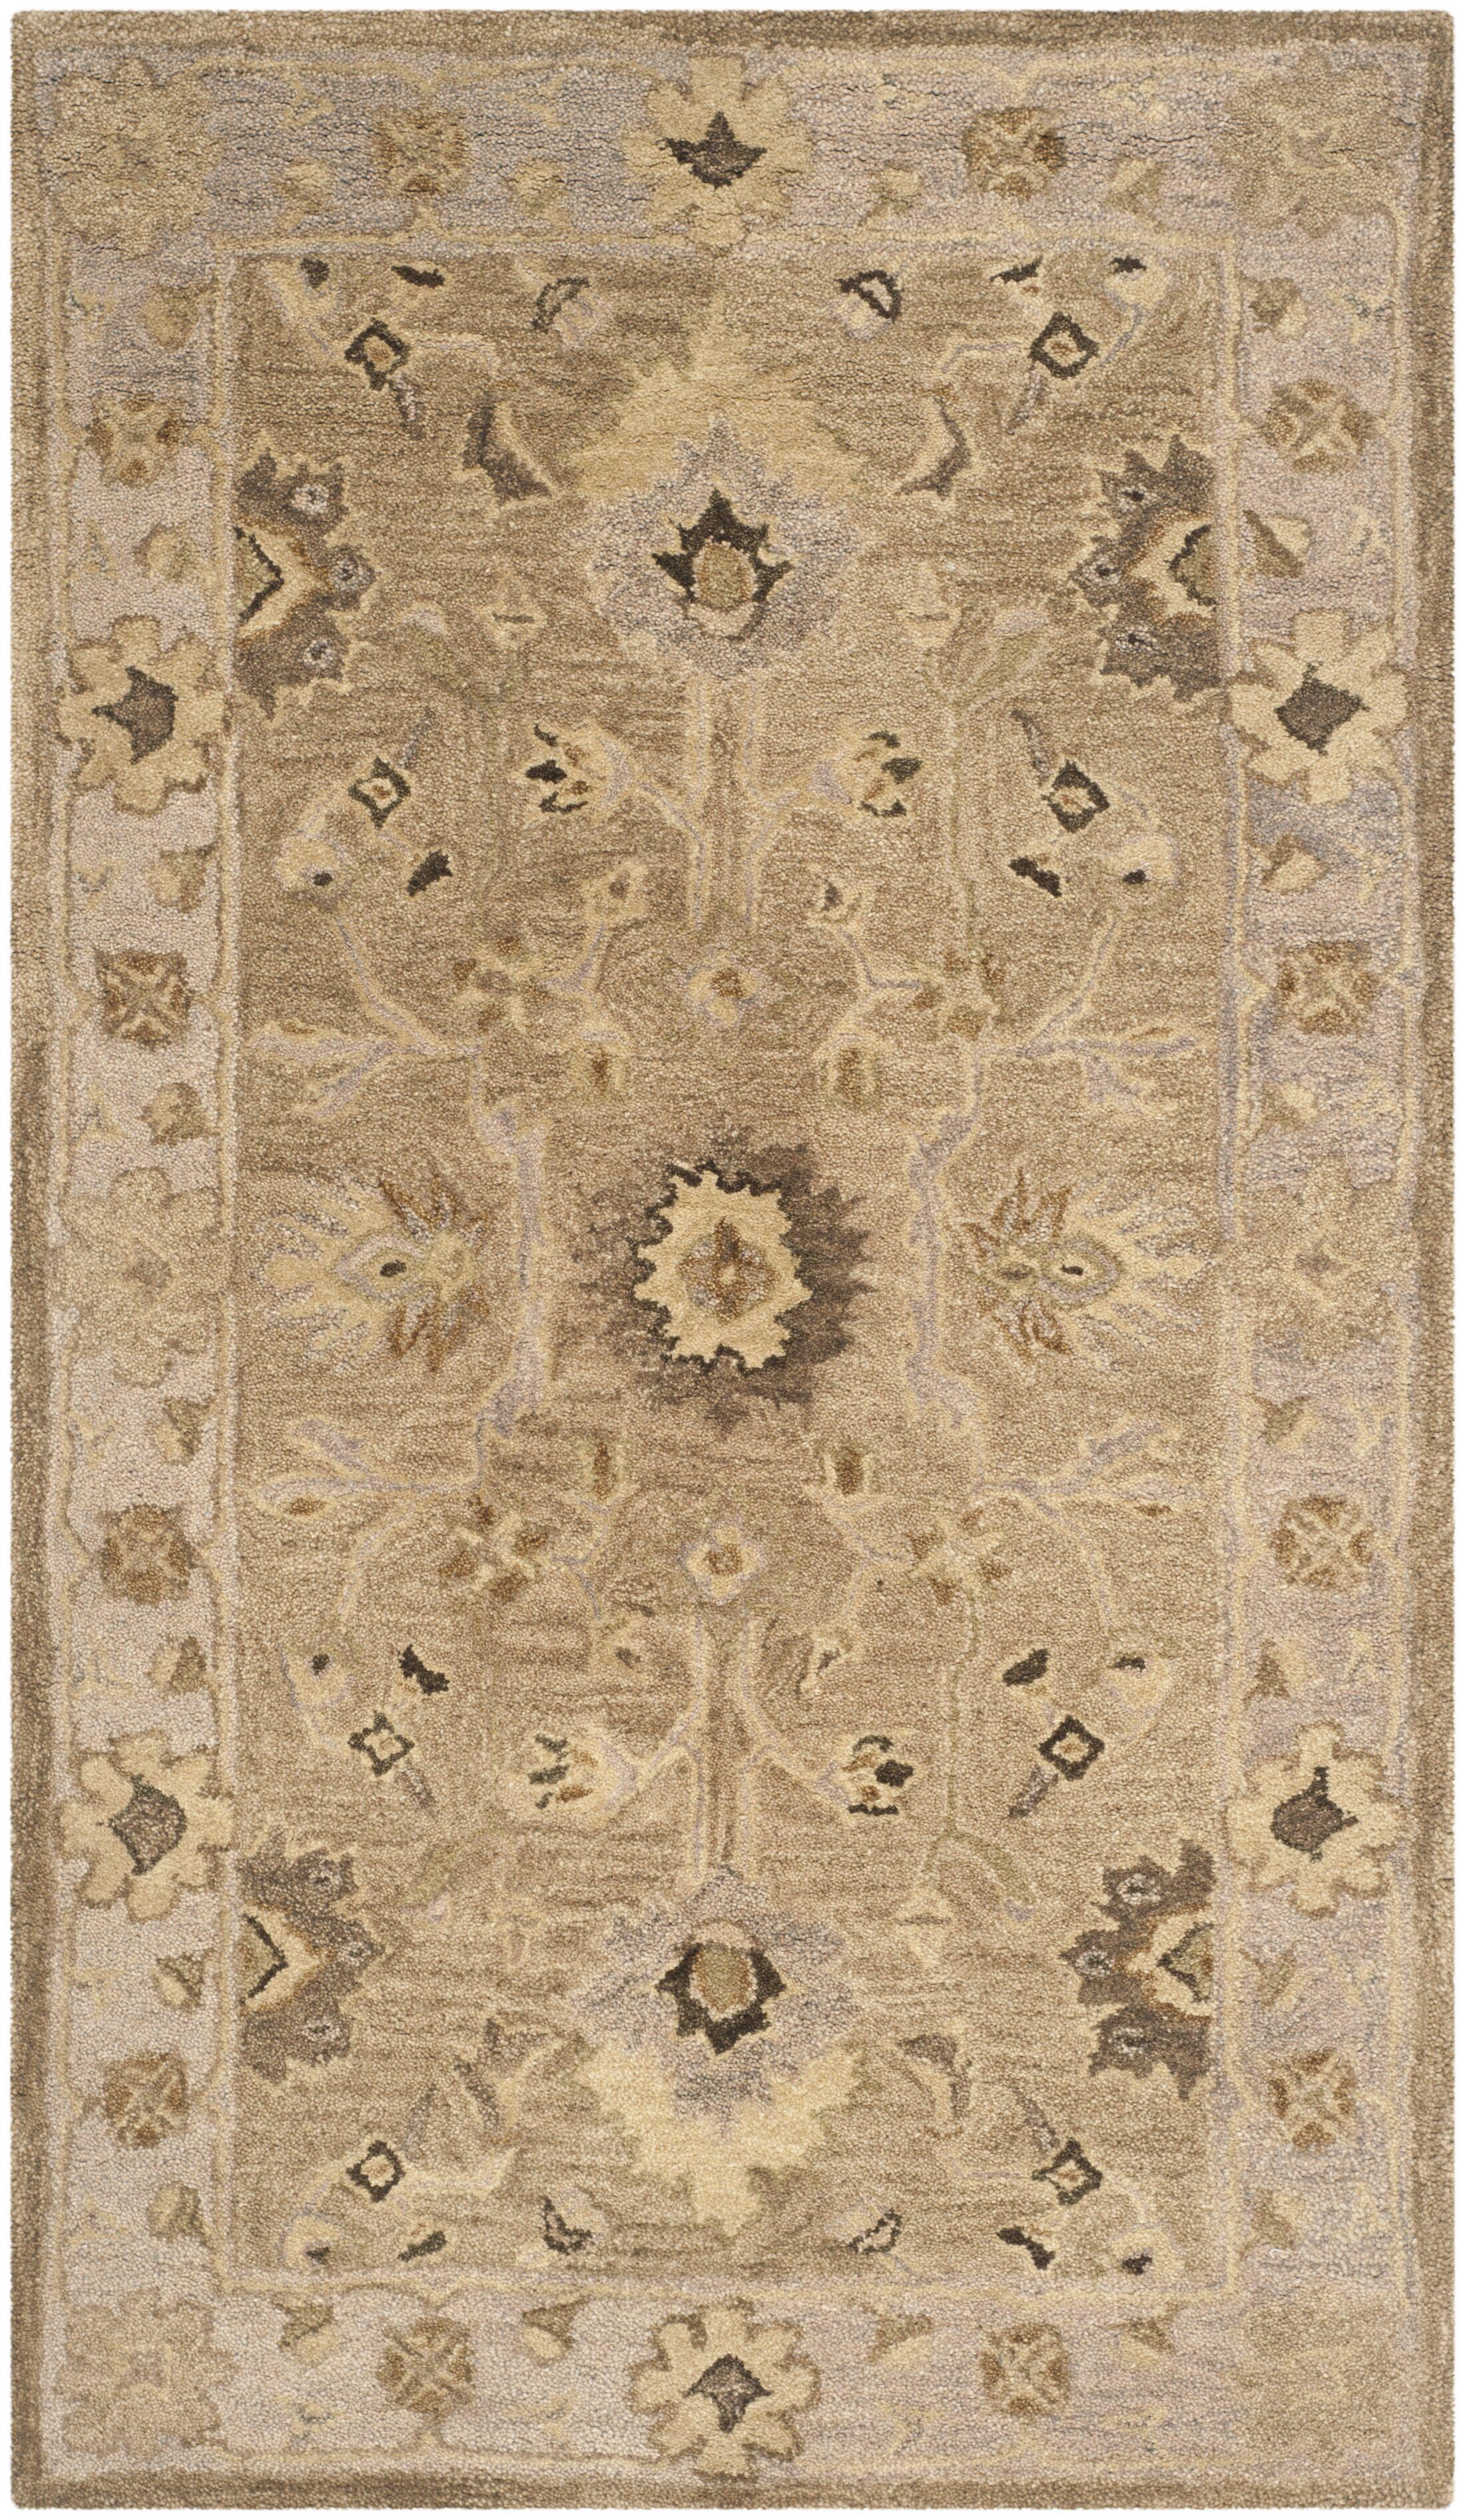 Anatolia Tan/Ivory Area Rug Rug Size: Rectangle 8' x 10'